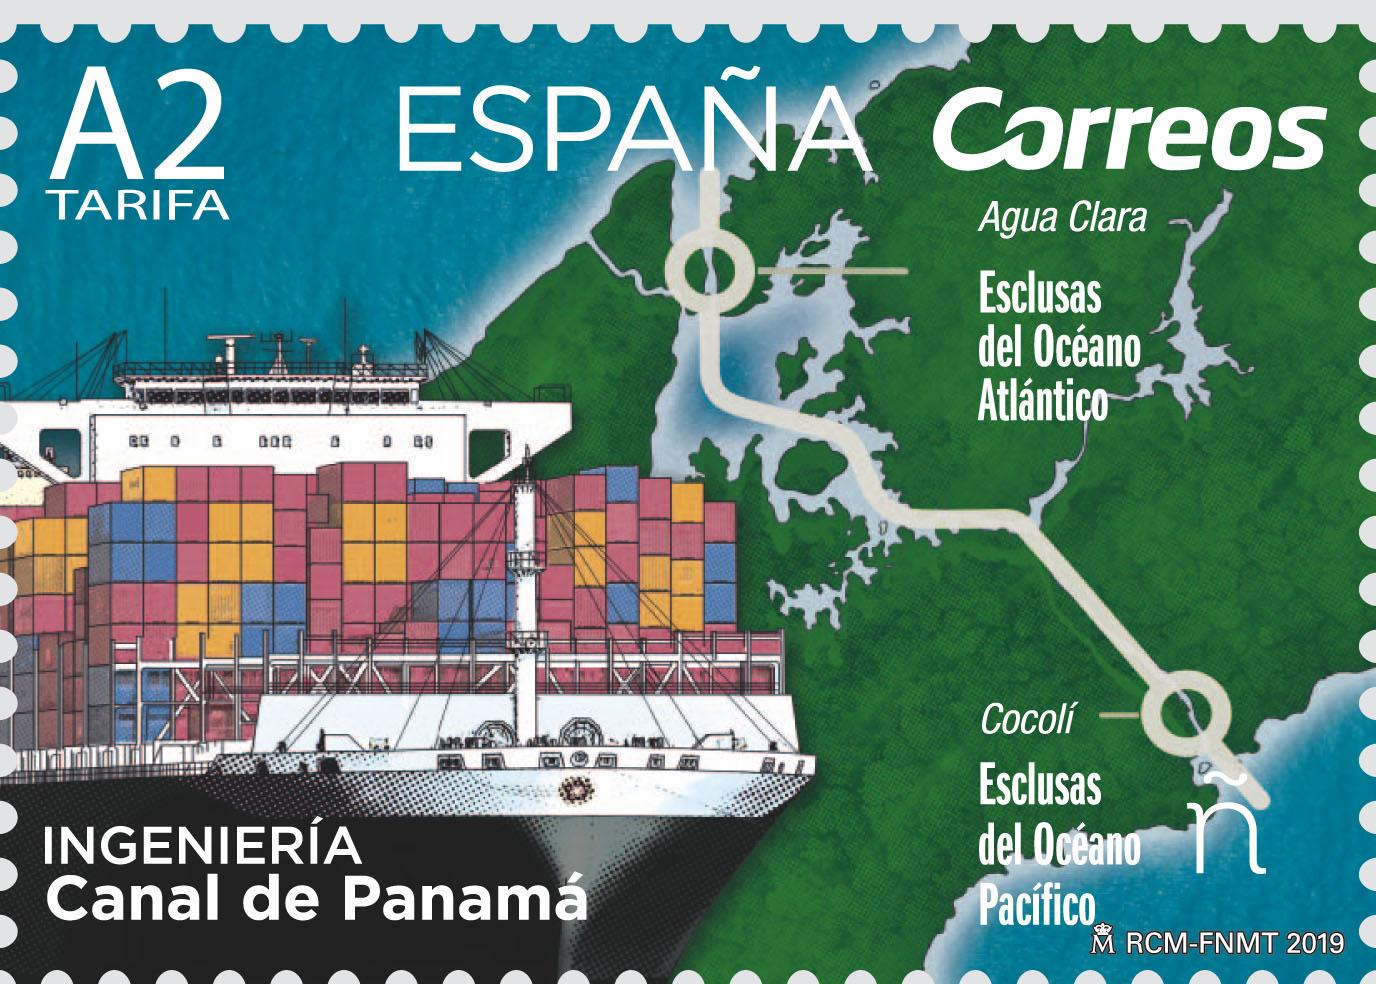 Spain - Engineering: Panama Canal (January 2, 2019)